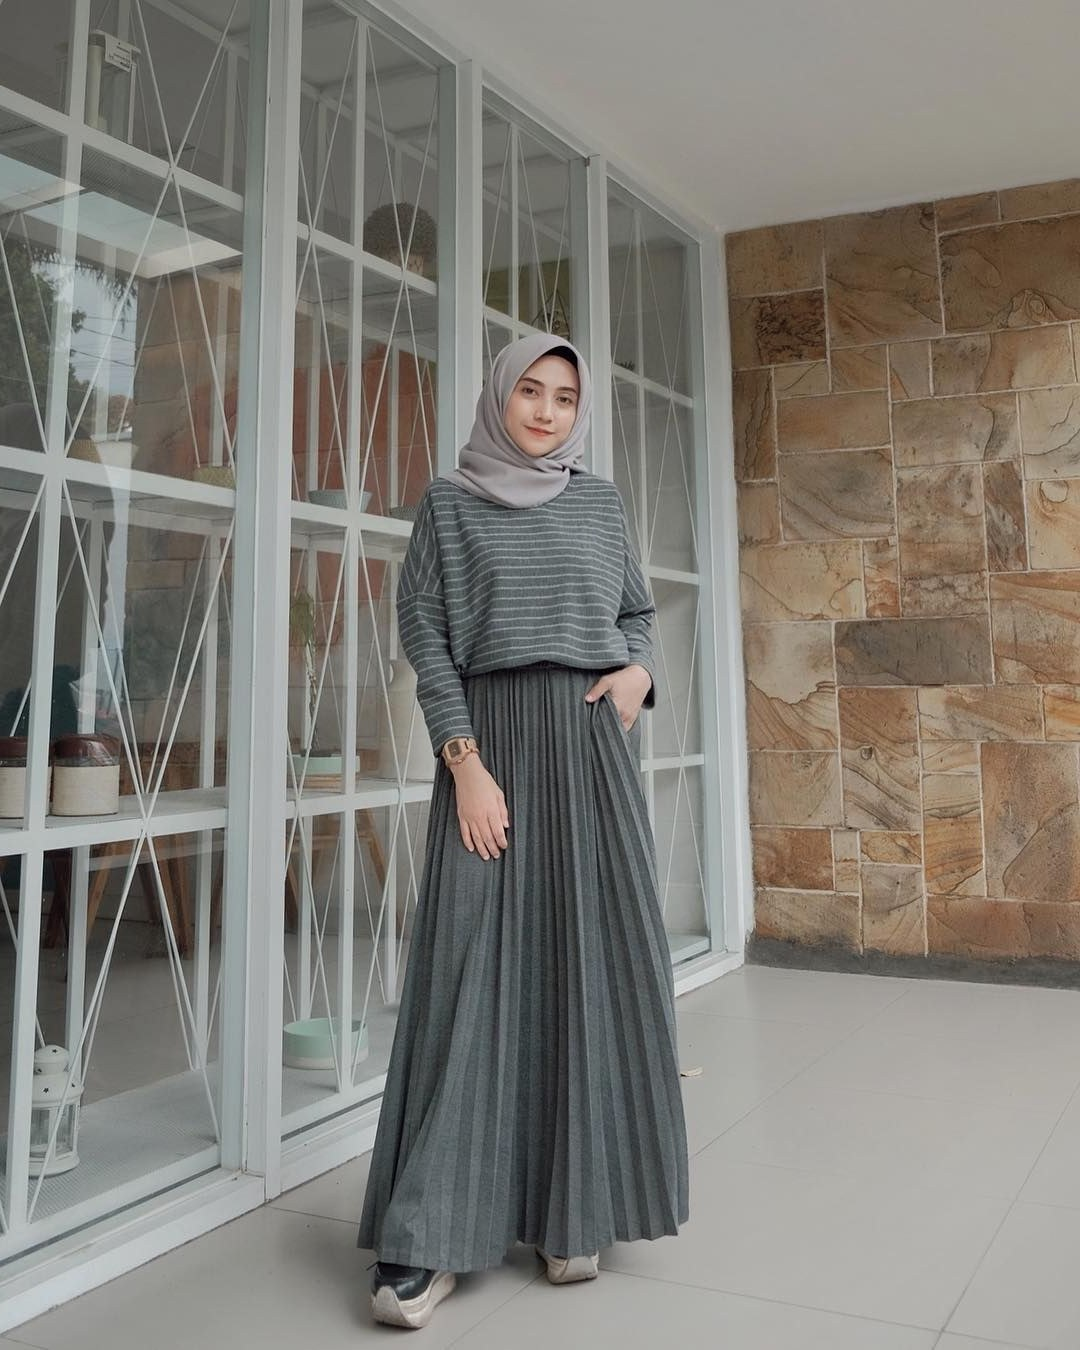 Design Model Baju Lebaran Tahun 2019 Tldn Baju Muslim Lebaran Terbaru 2019 Dengan Gambar